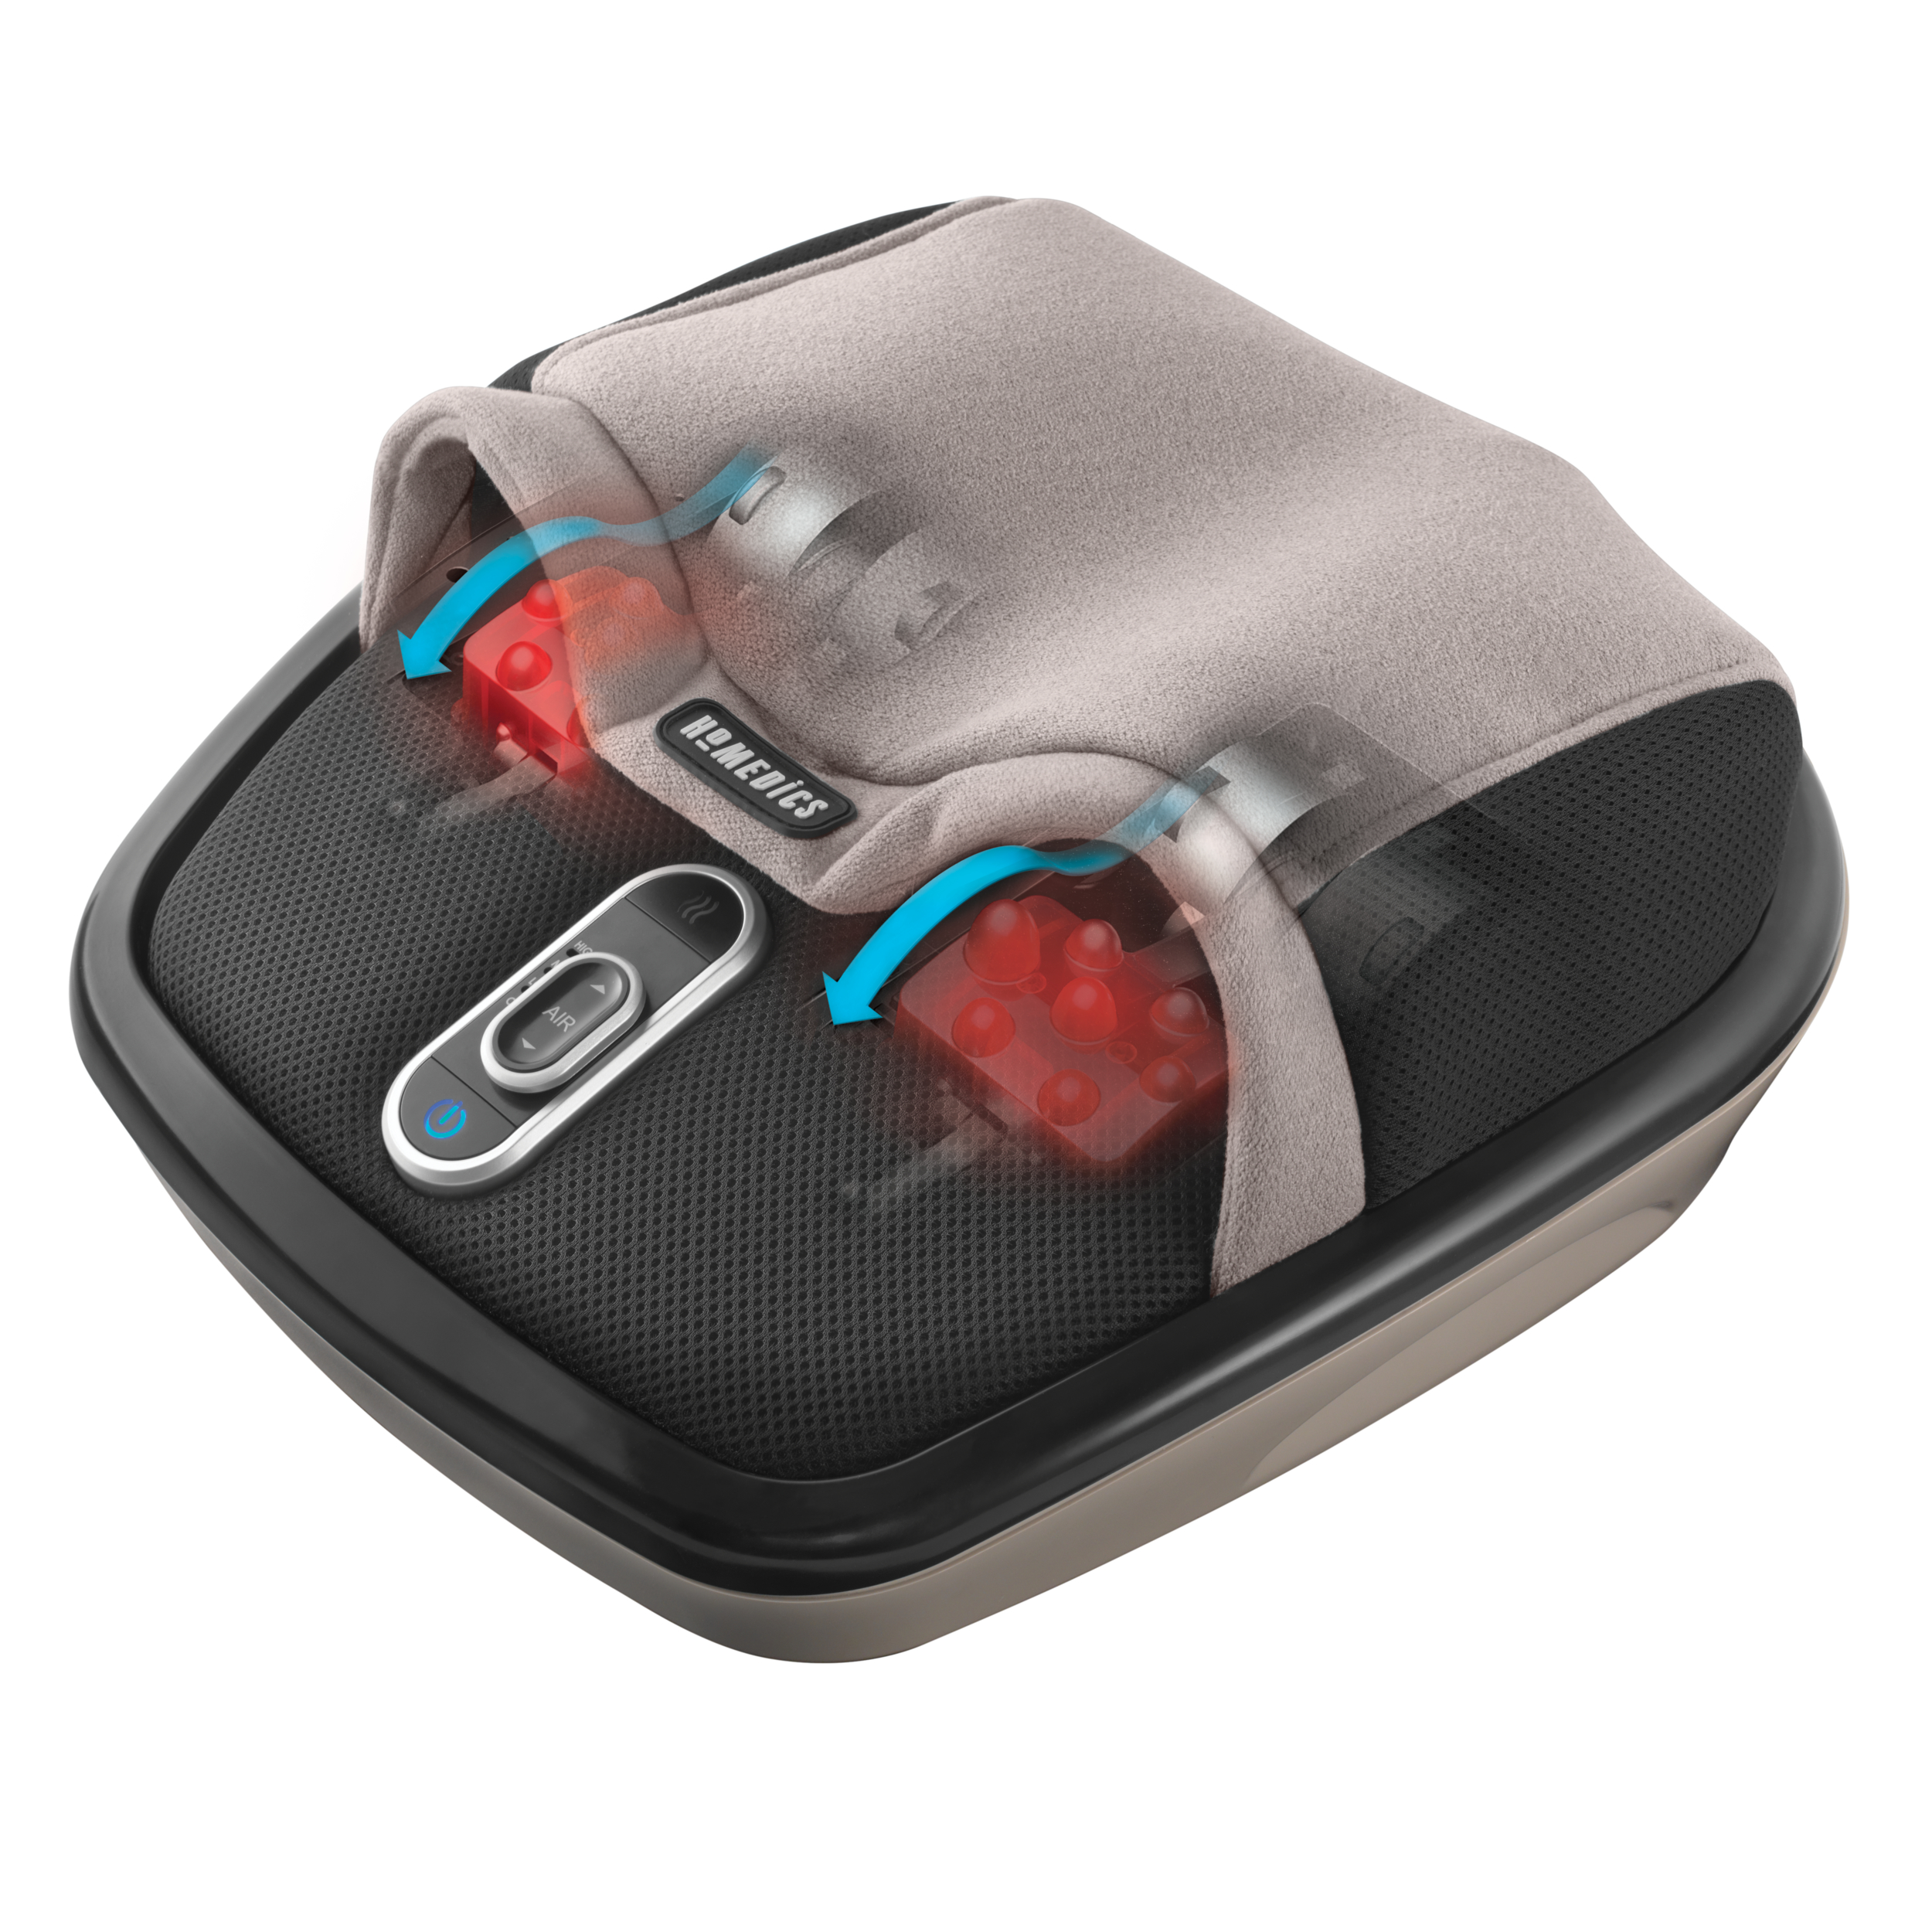 HoMedics Air Compression + Shiatsu Foot Massager, Shiatsu Air MAX FMS-305H